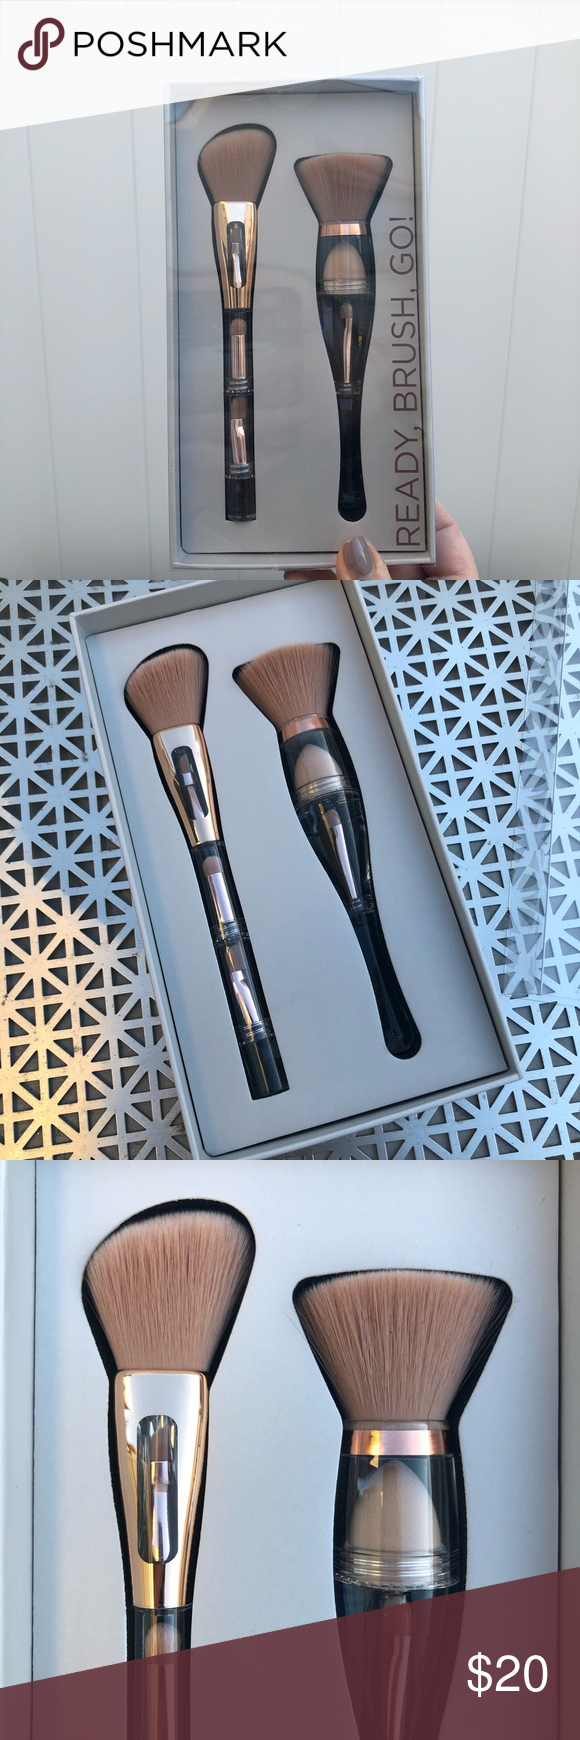 Makeup Brush Set NWT Makeup brush set, Makeup brushes